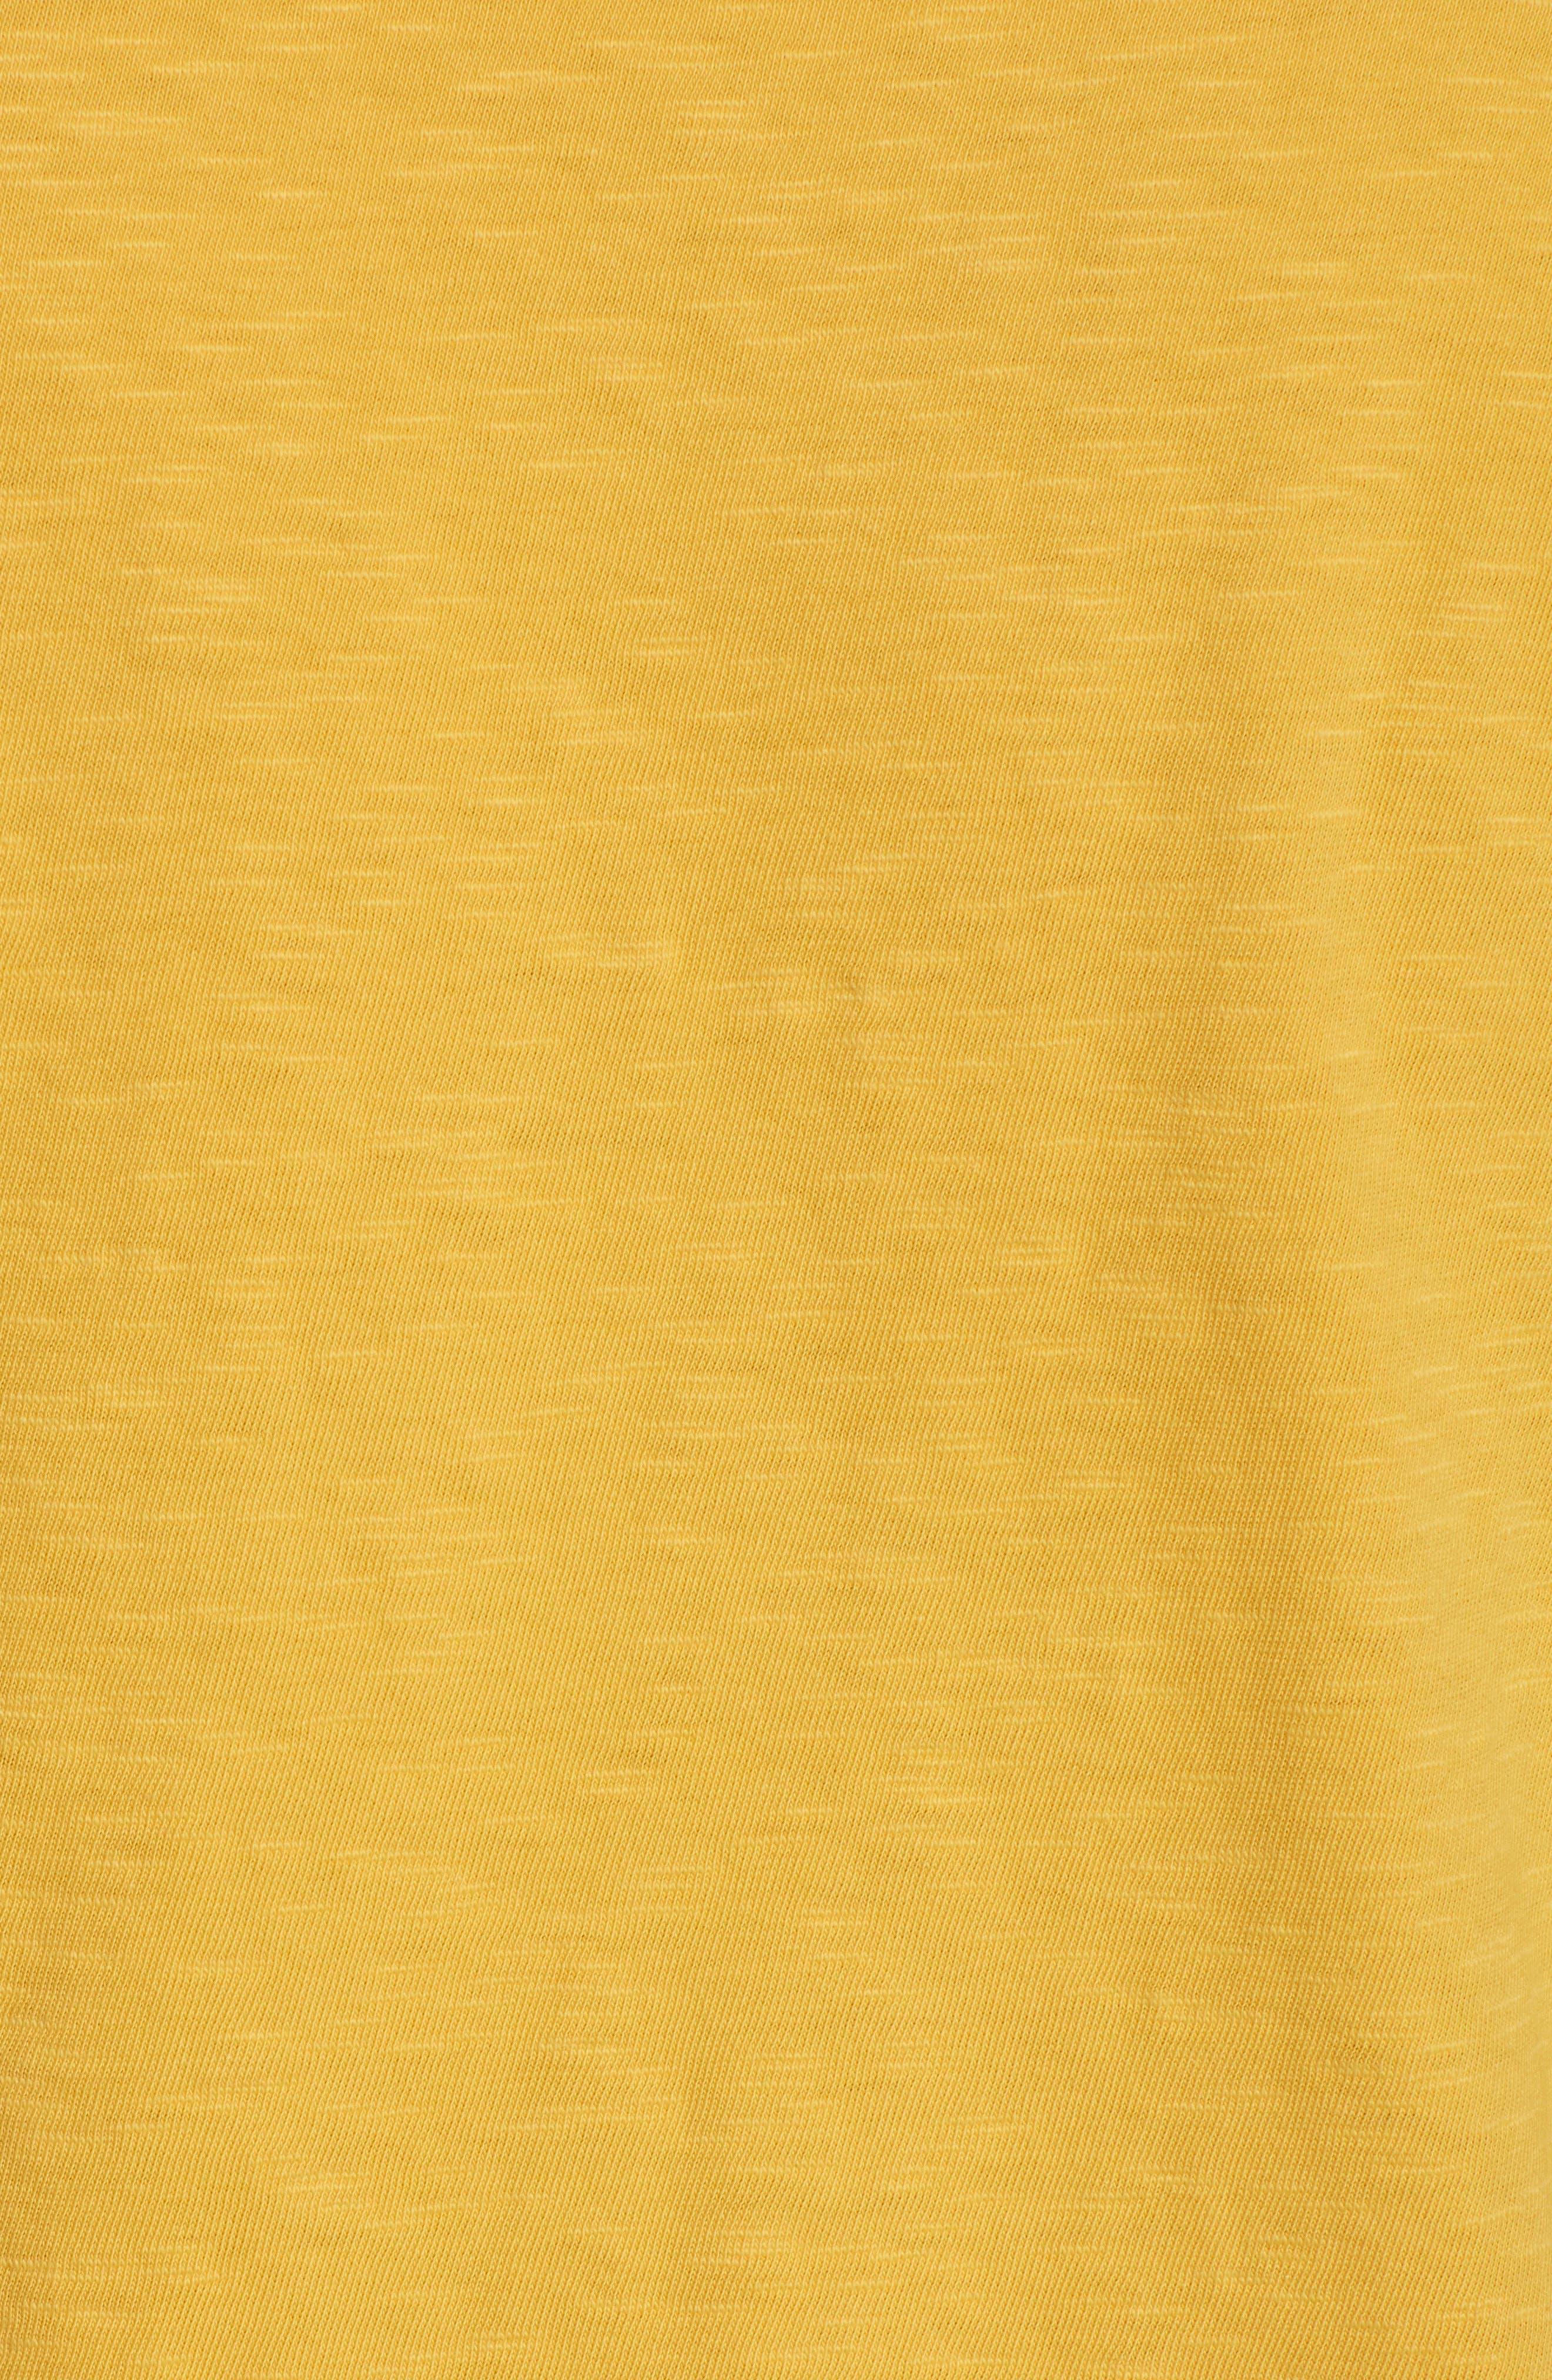 Soleil T-Shirt,                             Alternate thumbnail 5, color,                             Banana